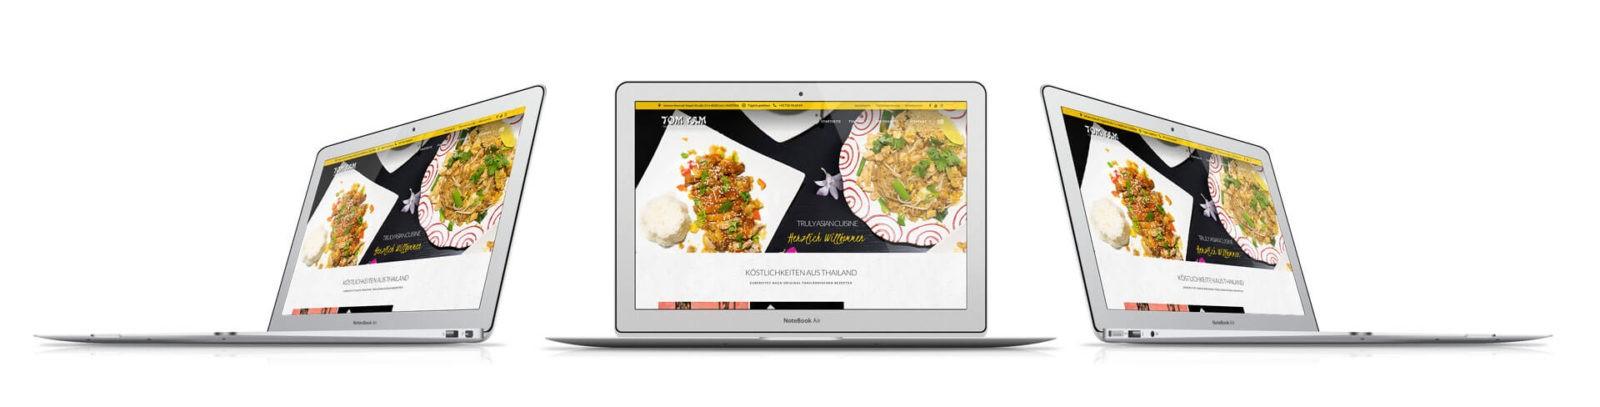 Webseite Tomyam